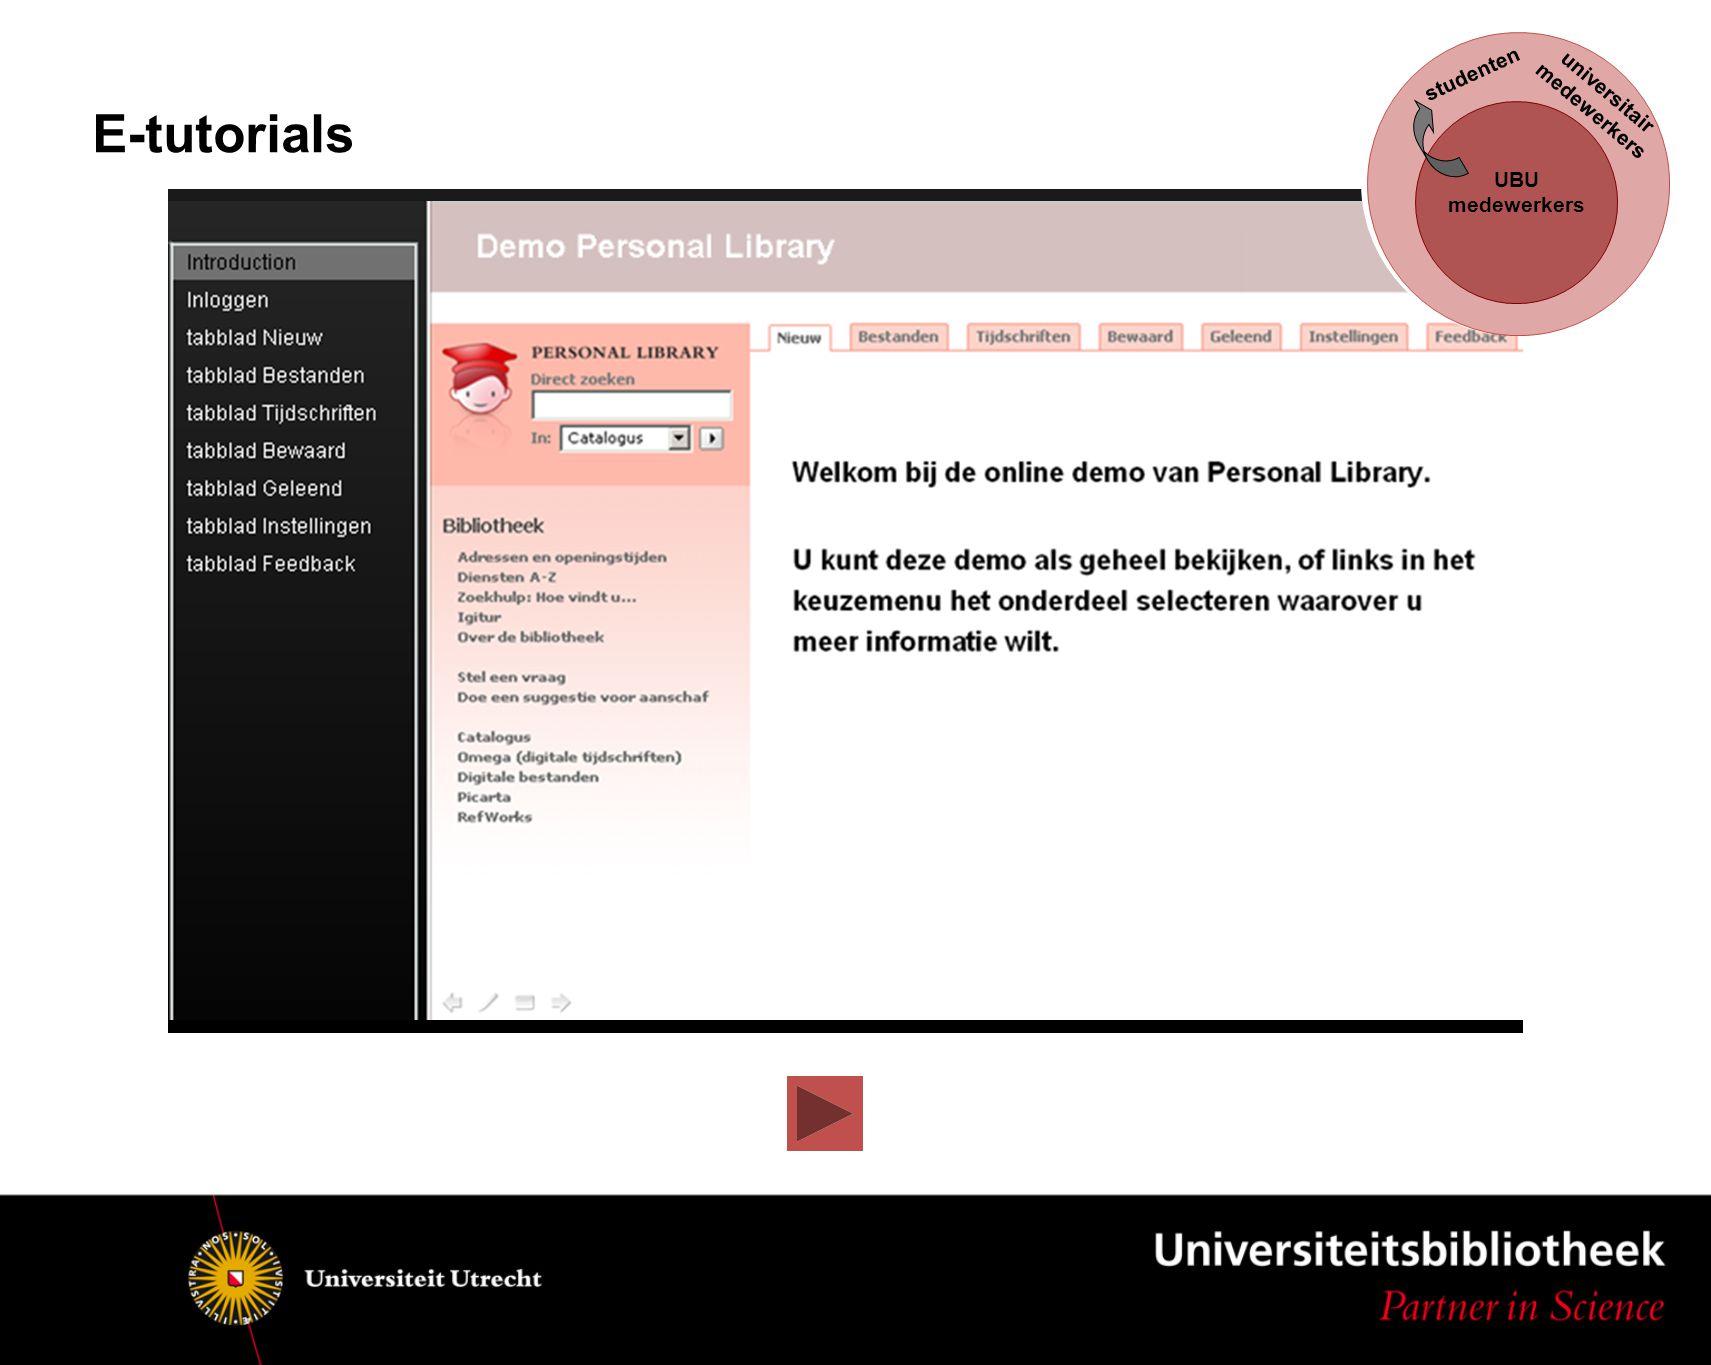 UBU medewerkers studenten universitair medewerkers E-tutorials